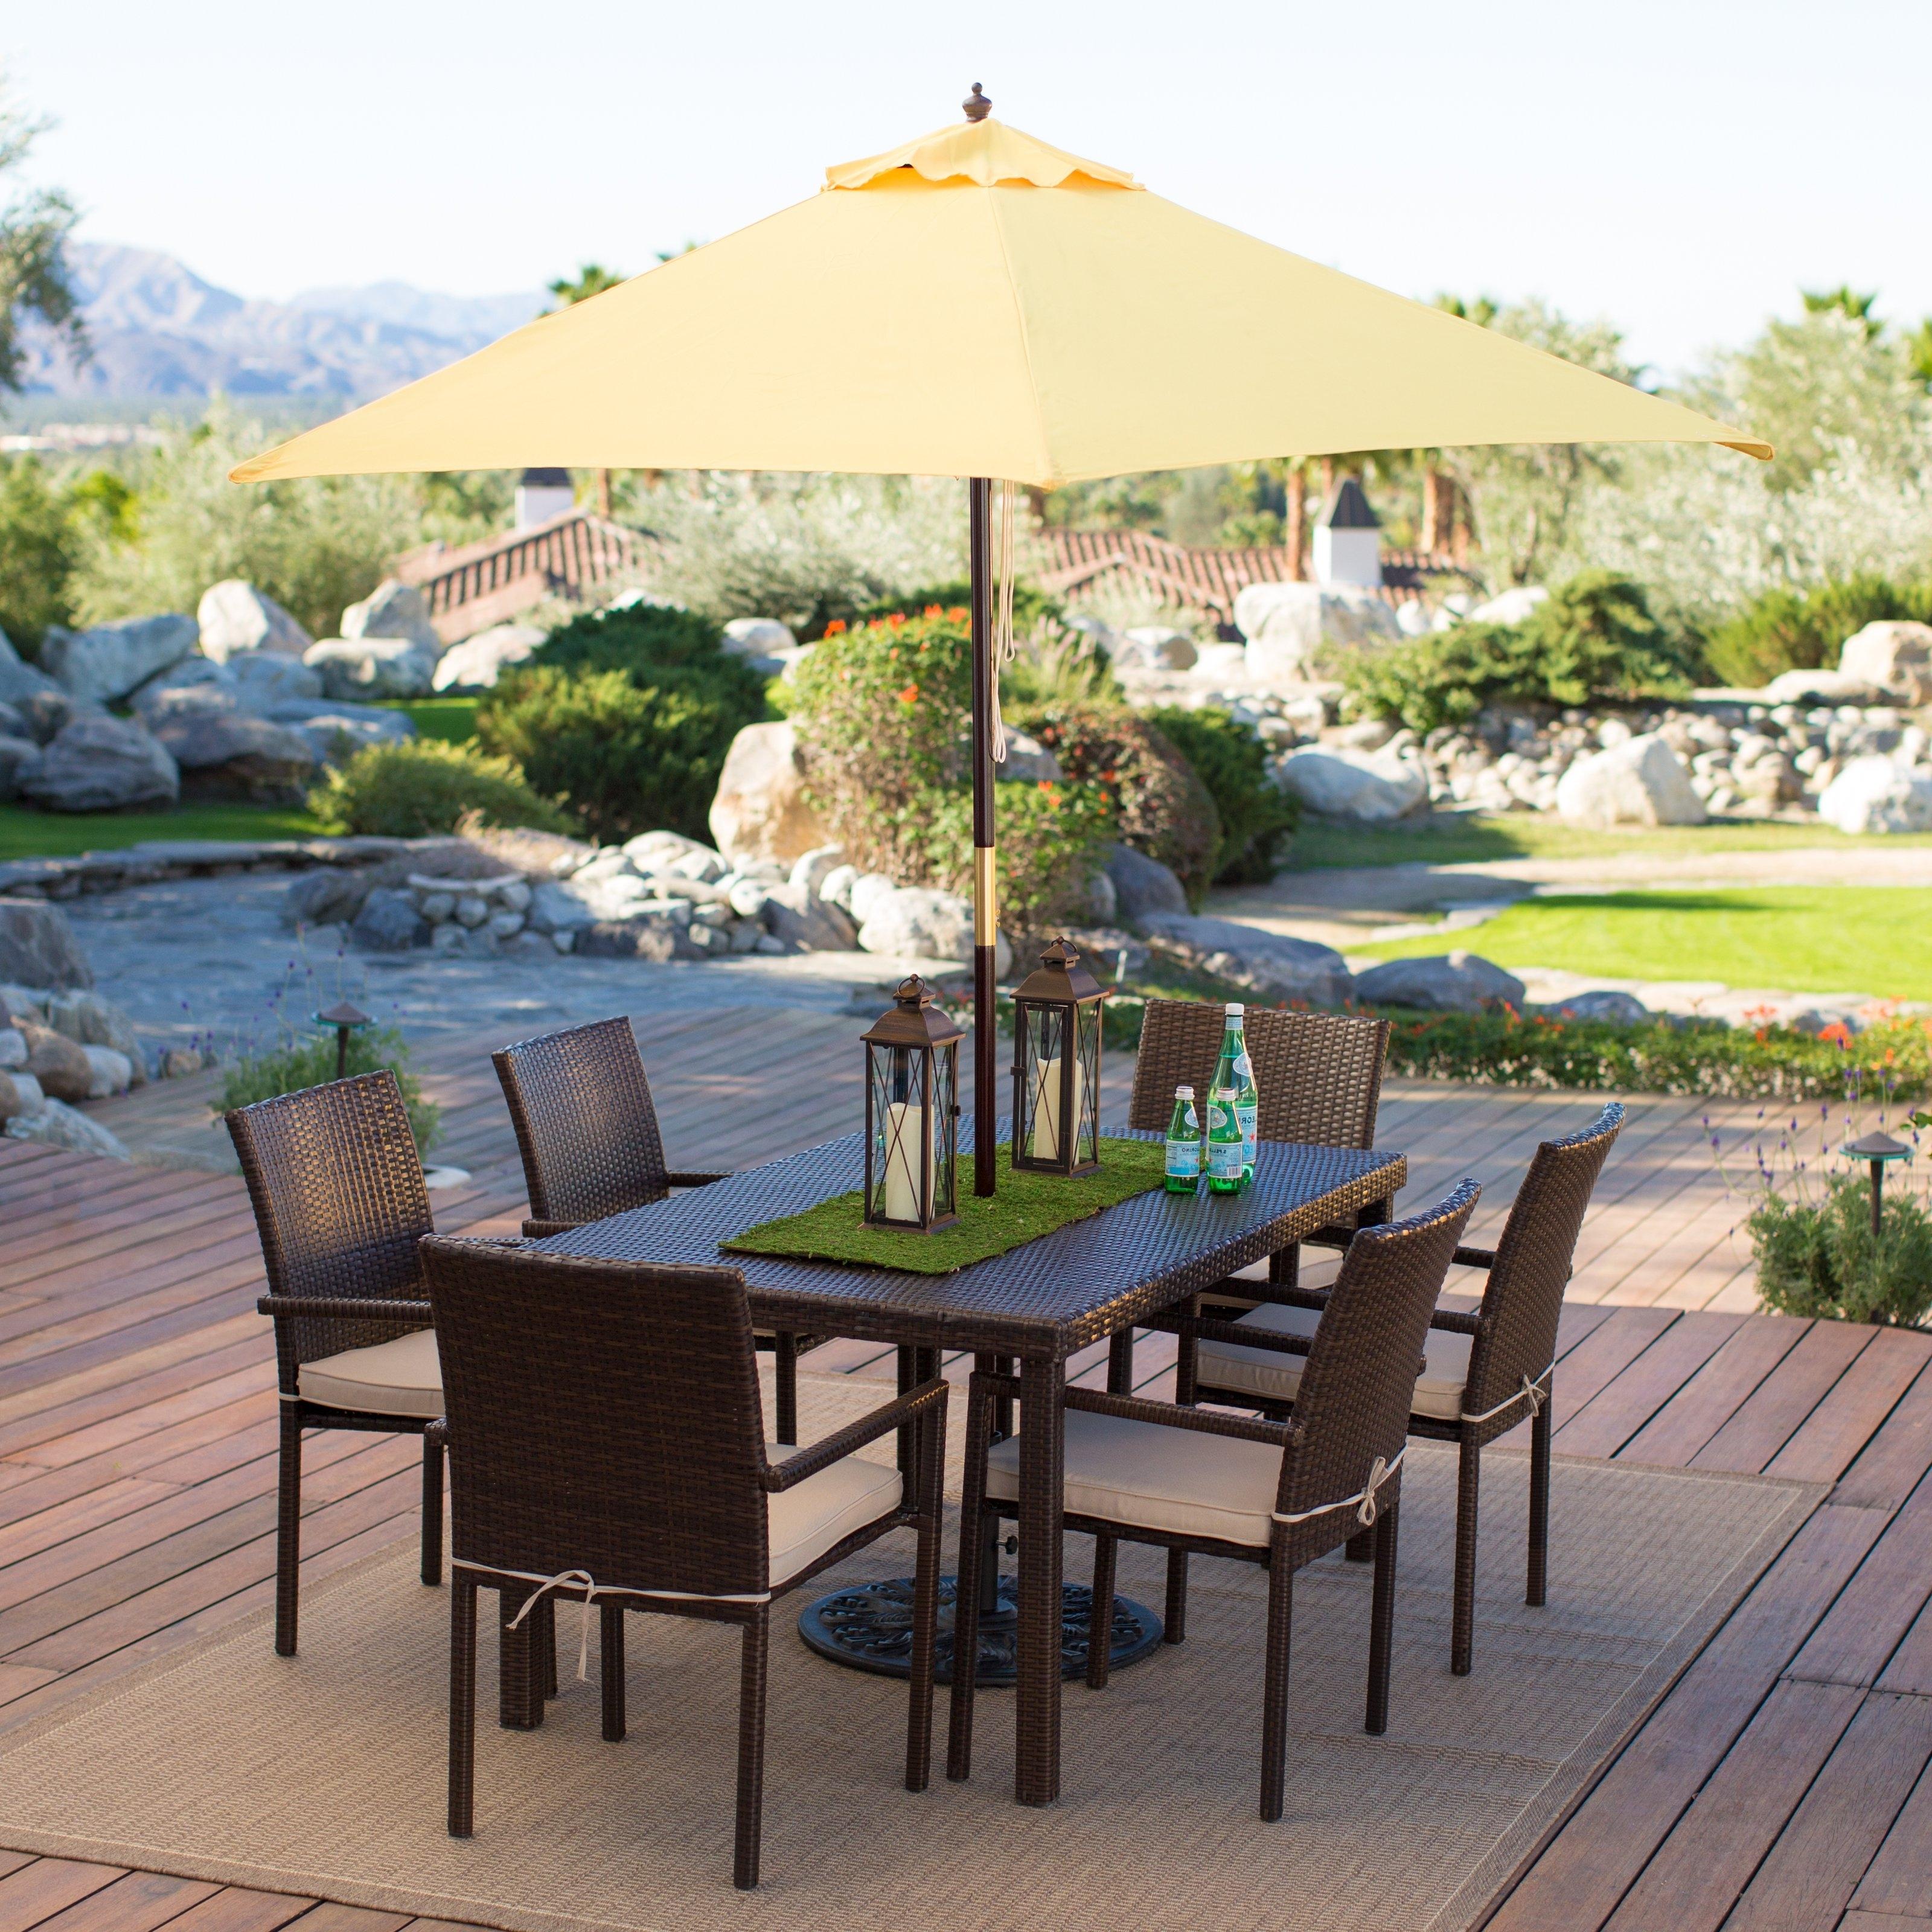 Garden: Enchanting Outdoor Patio Decor Ideas With Patio Umbrellas With Widely Used Rectangular Patio Umbrellas (View 10 of 20)